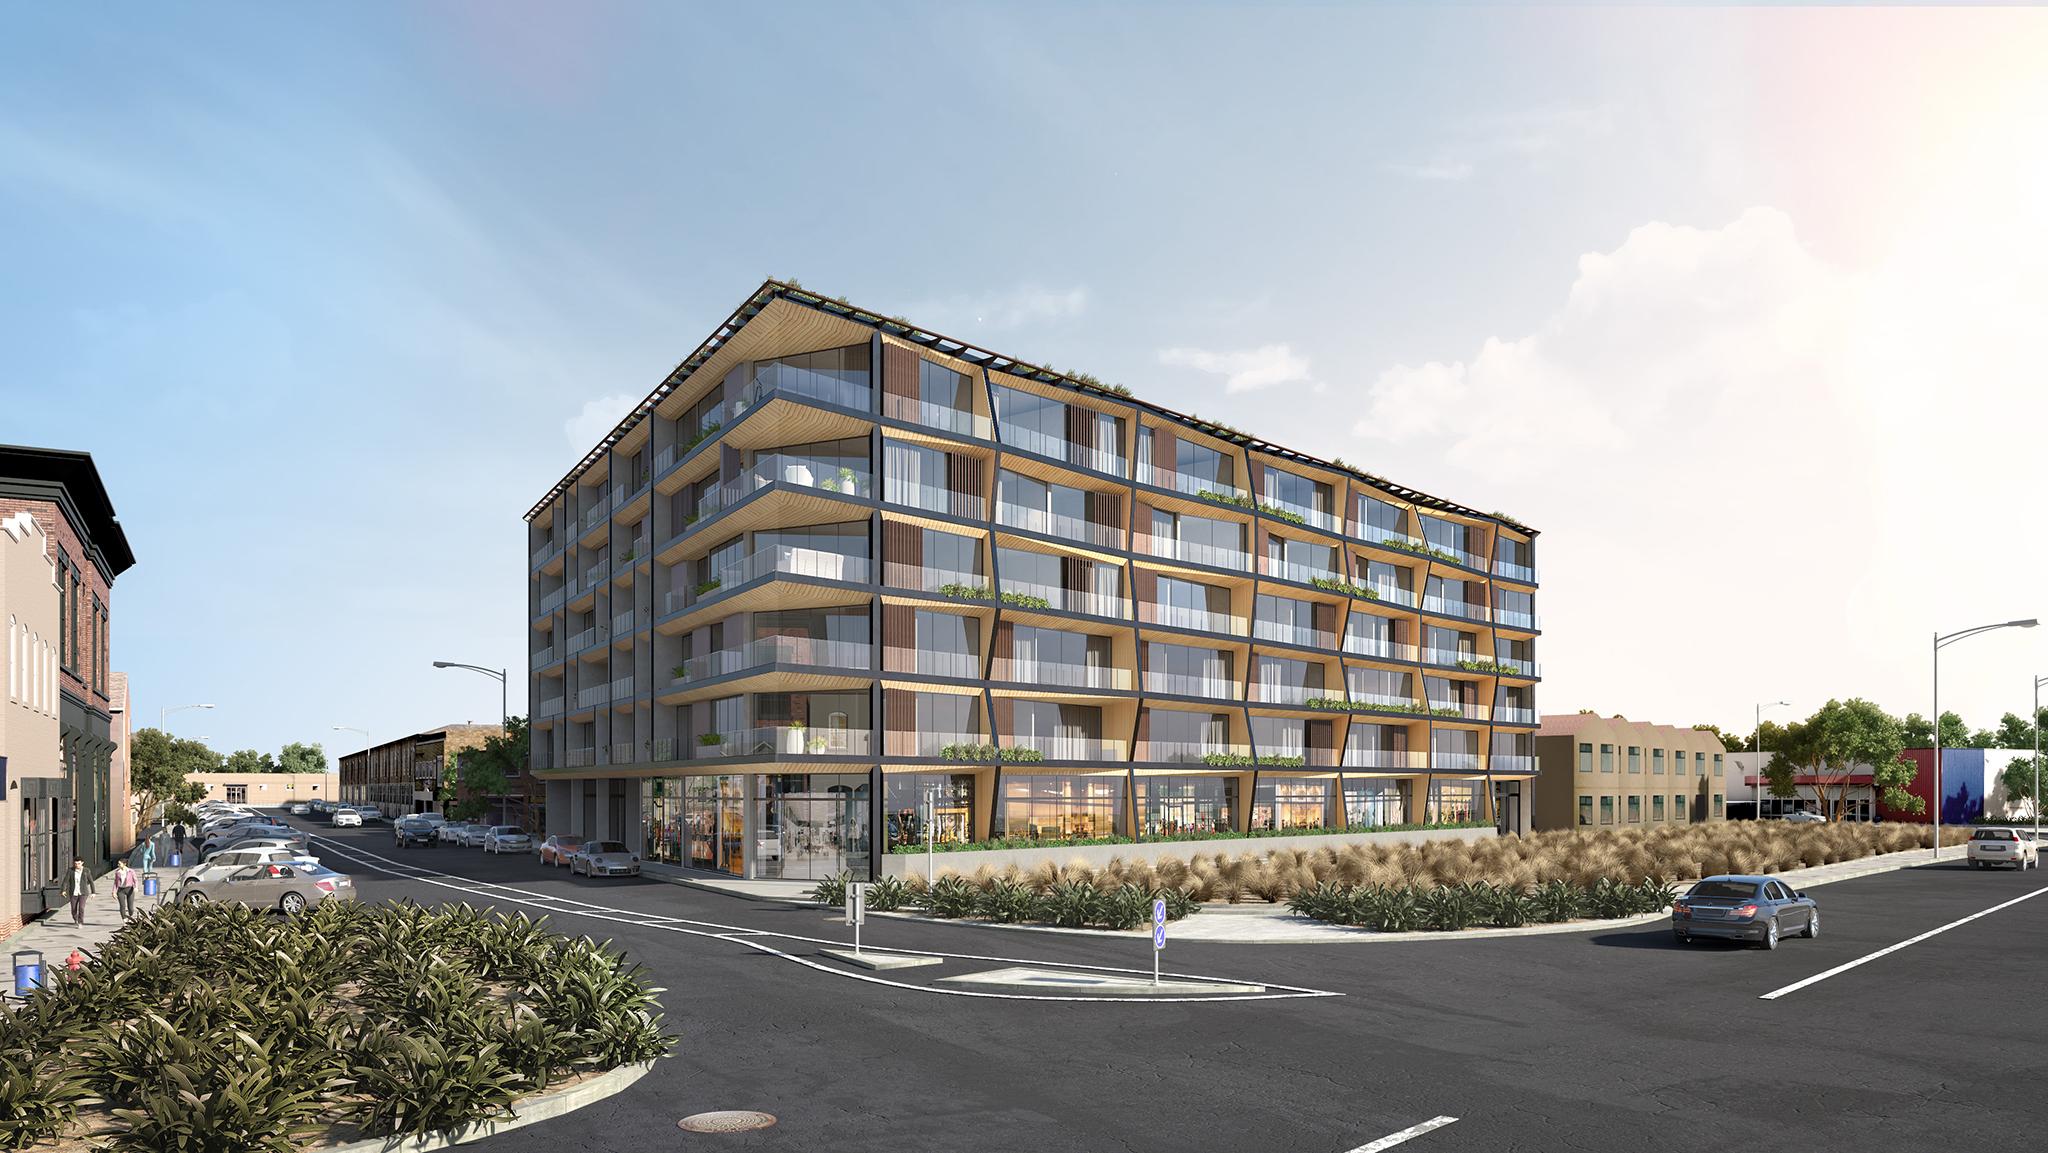 KSS-Building_Exterior_Street_View_02 SMALL